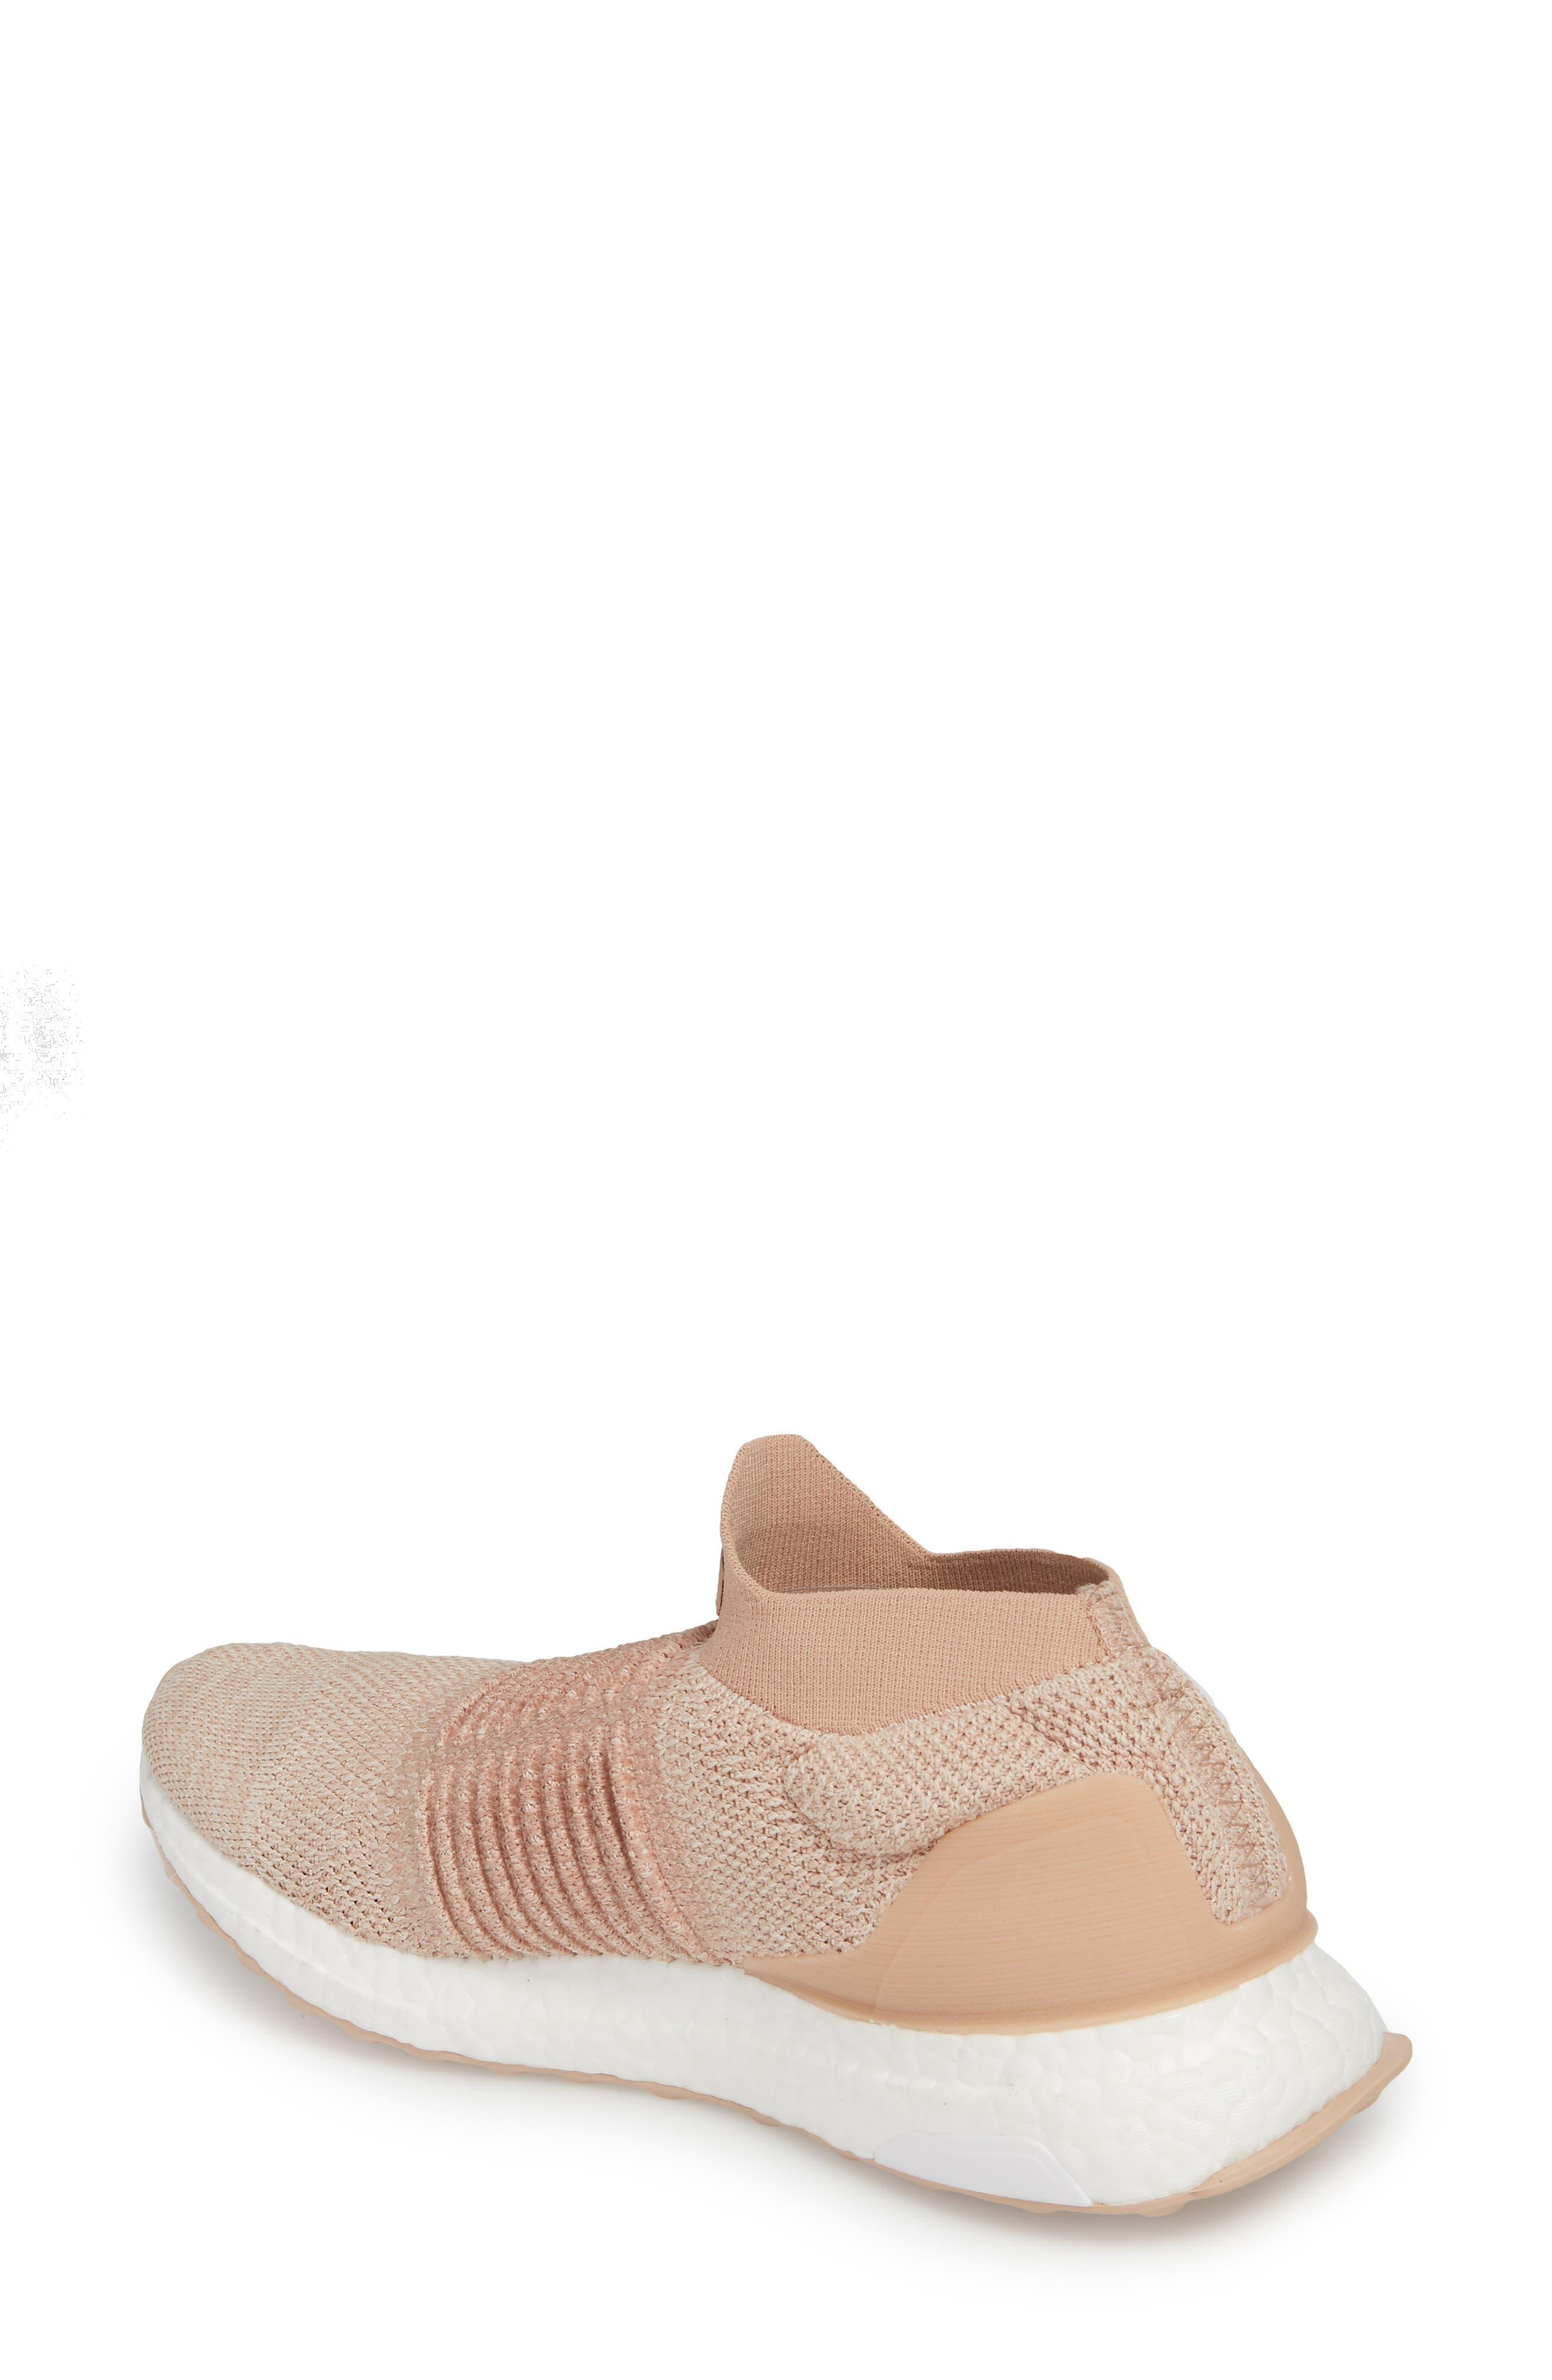 UltraBoost Laceless Running Shoe,                             Alternate thumbnail 2, color,                             Ash Pearl/ Ash Pearl